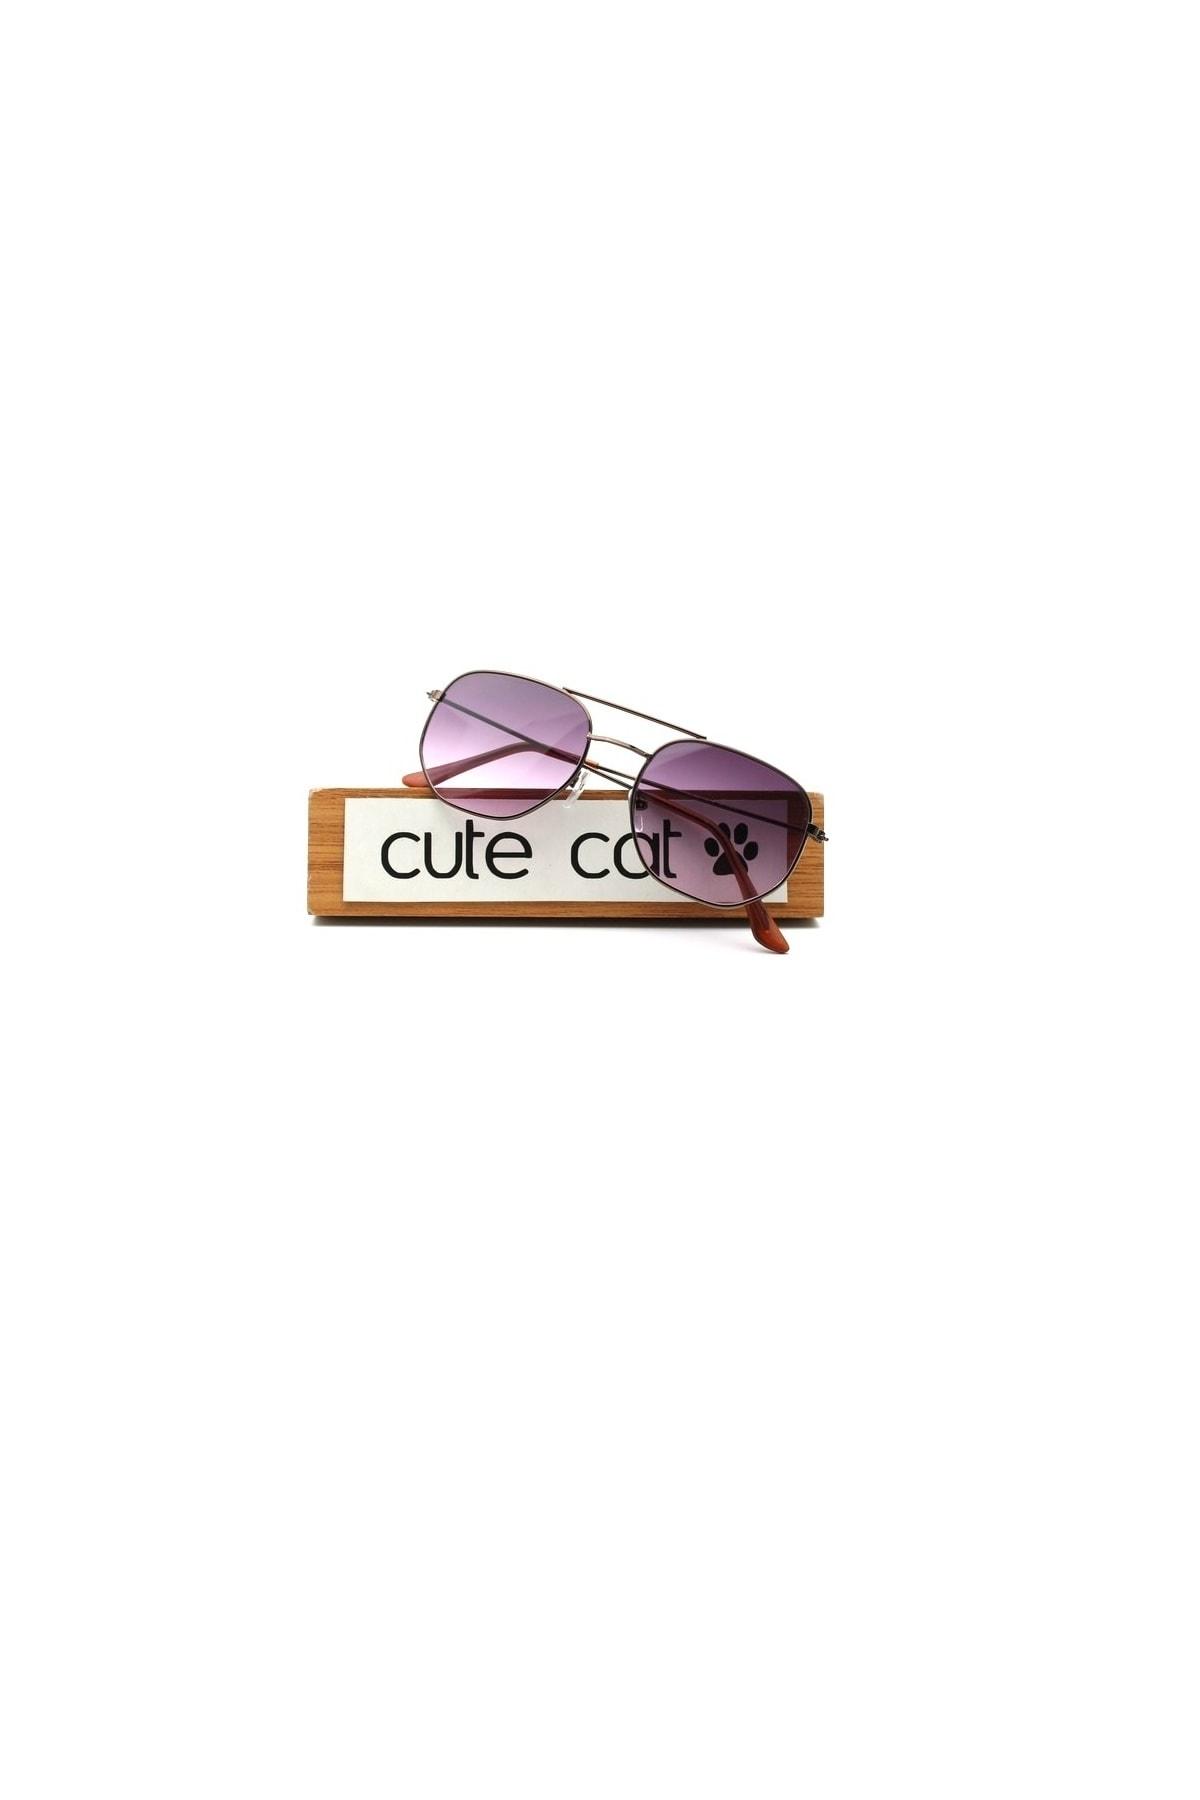 CUTE CAT Hidra Purple Degrade Small Hexagon Unisex Güneş Gözlüğü 1